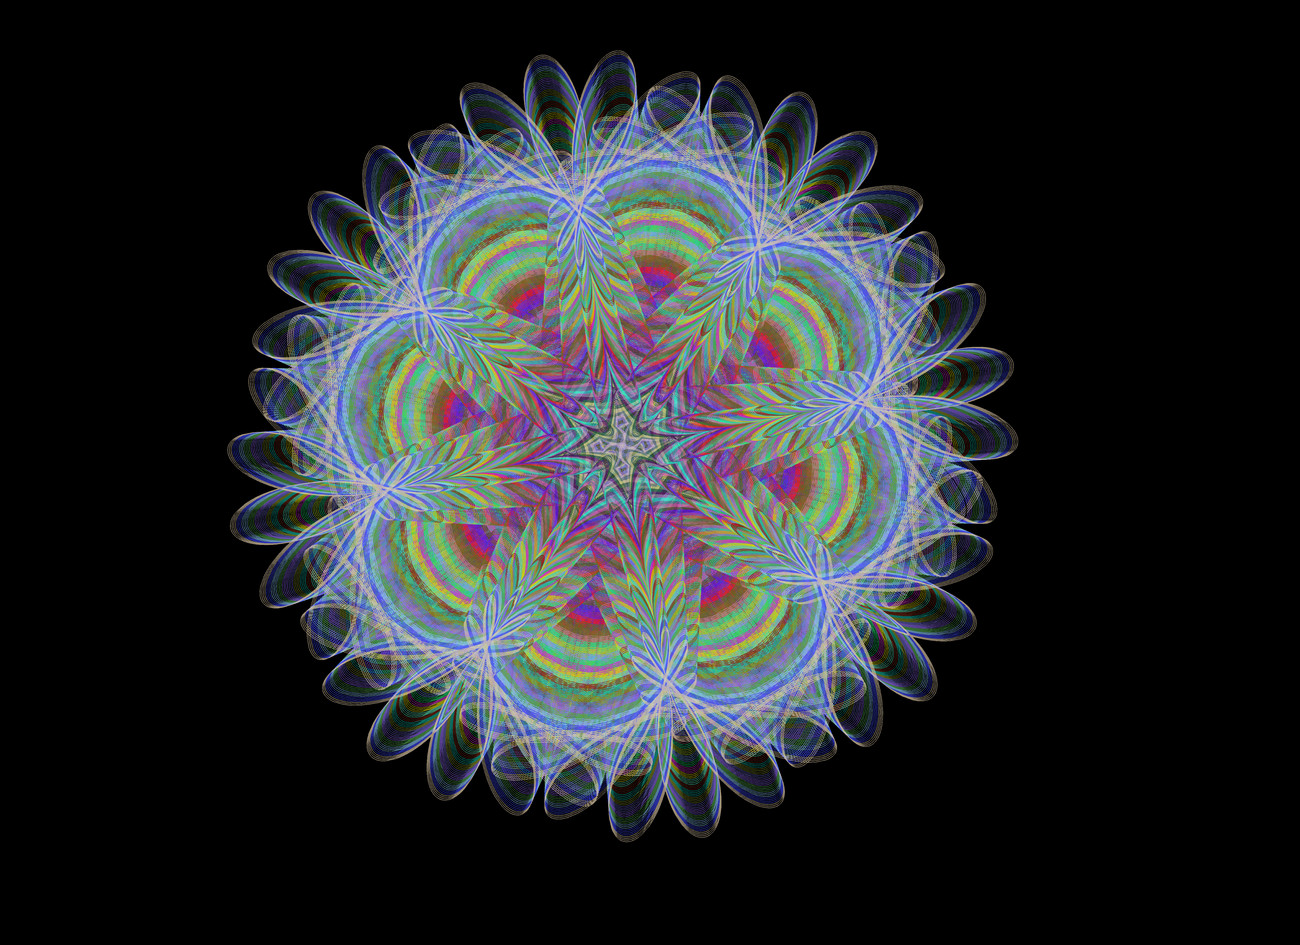 Spiralgraph